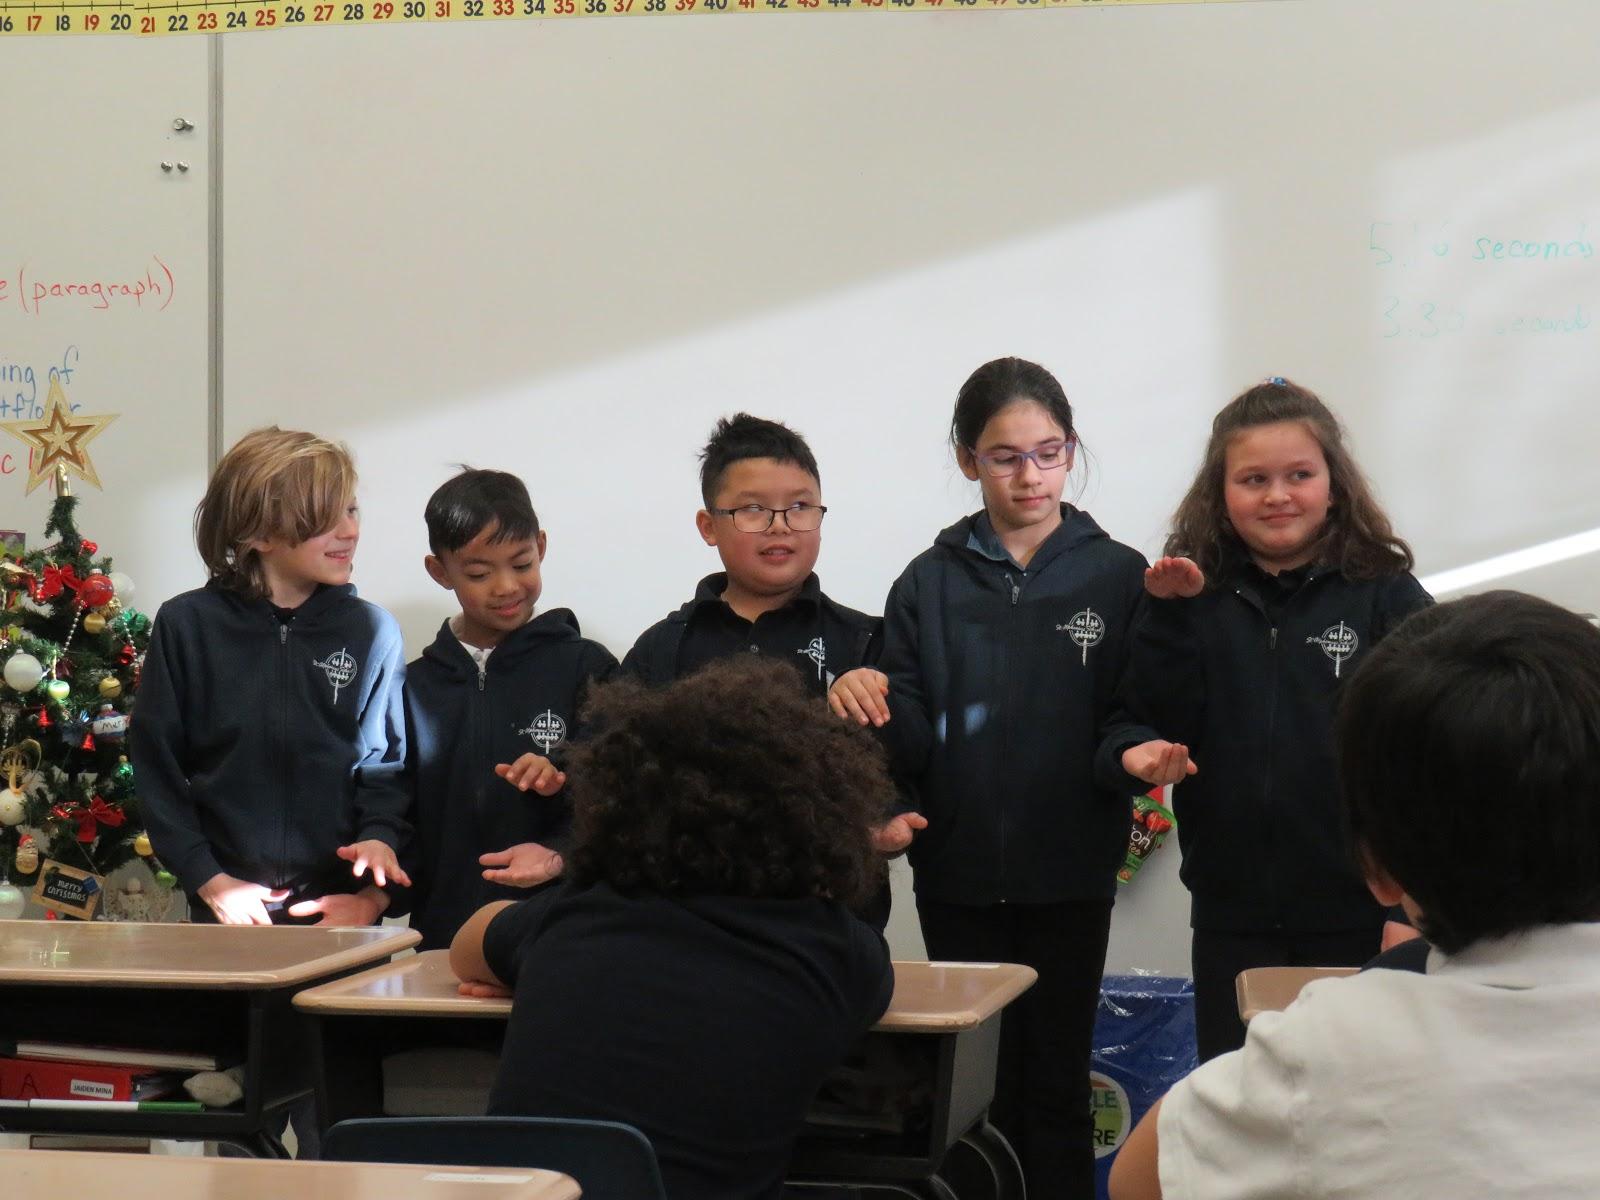 St Alphonsus School Grade 4